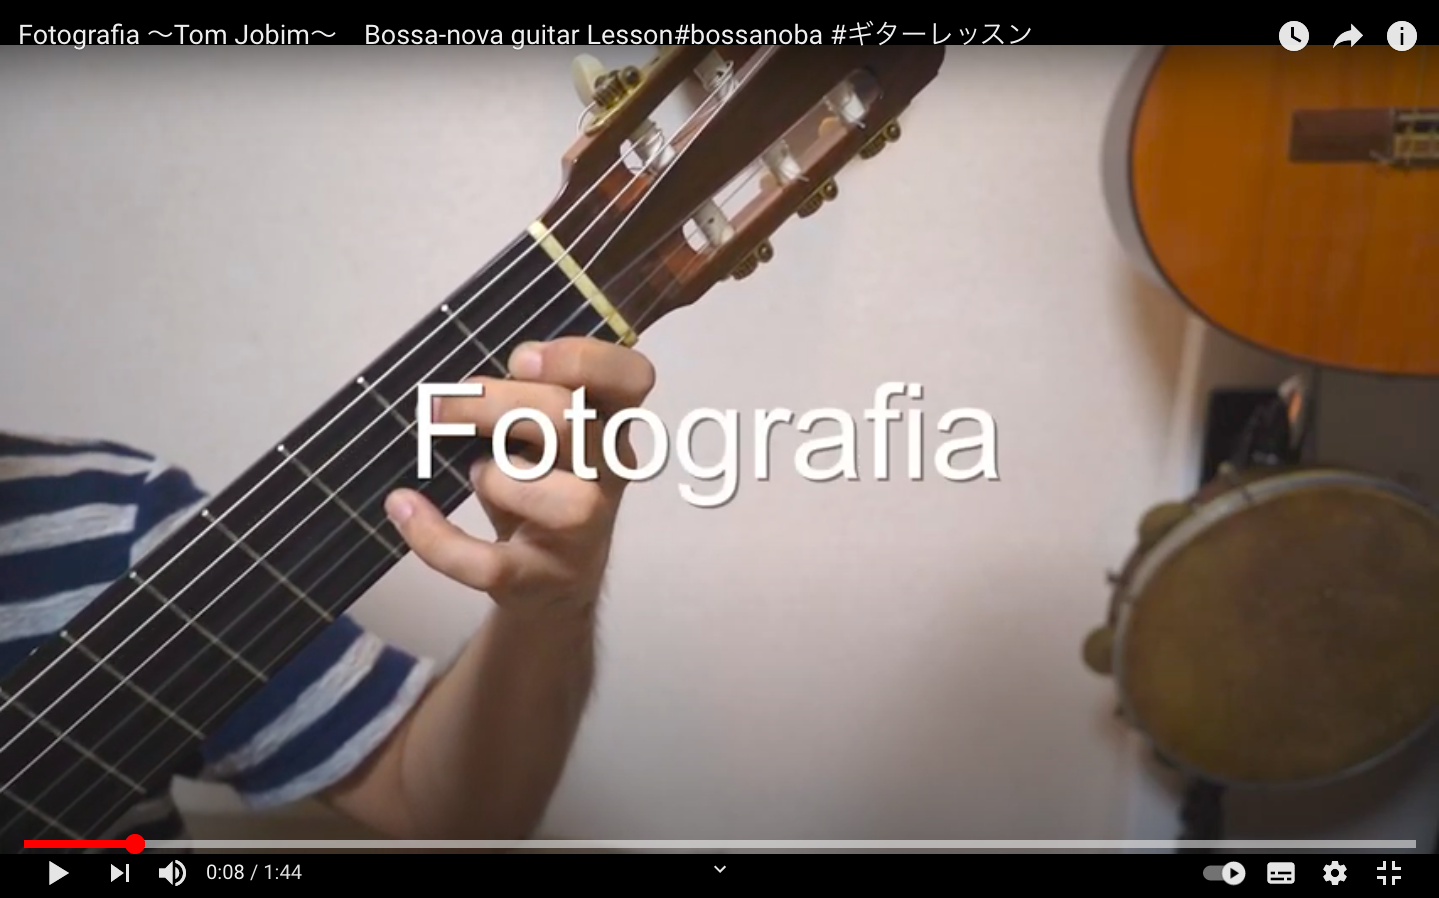 ♬Fotografia 〜Tom Jobim〜♬を弾いてみよう!